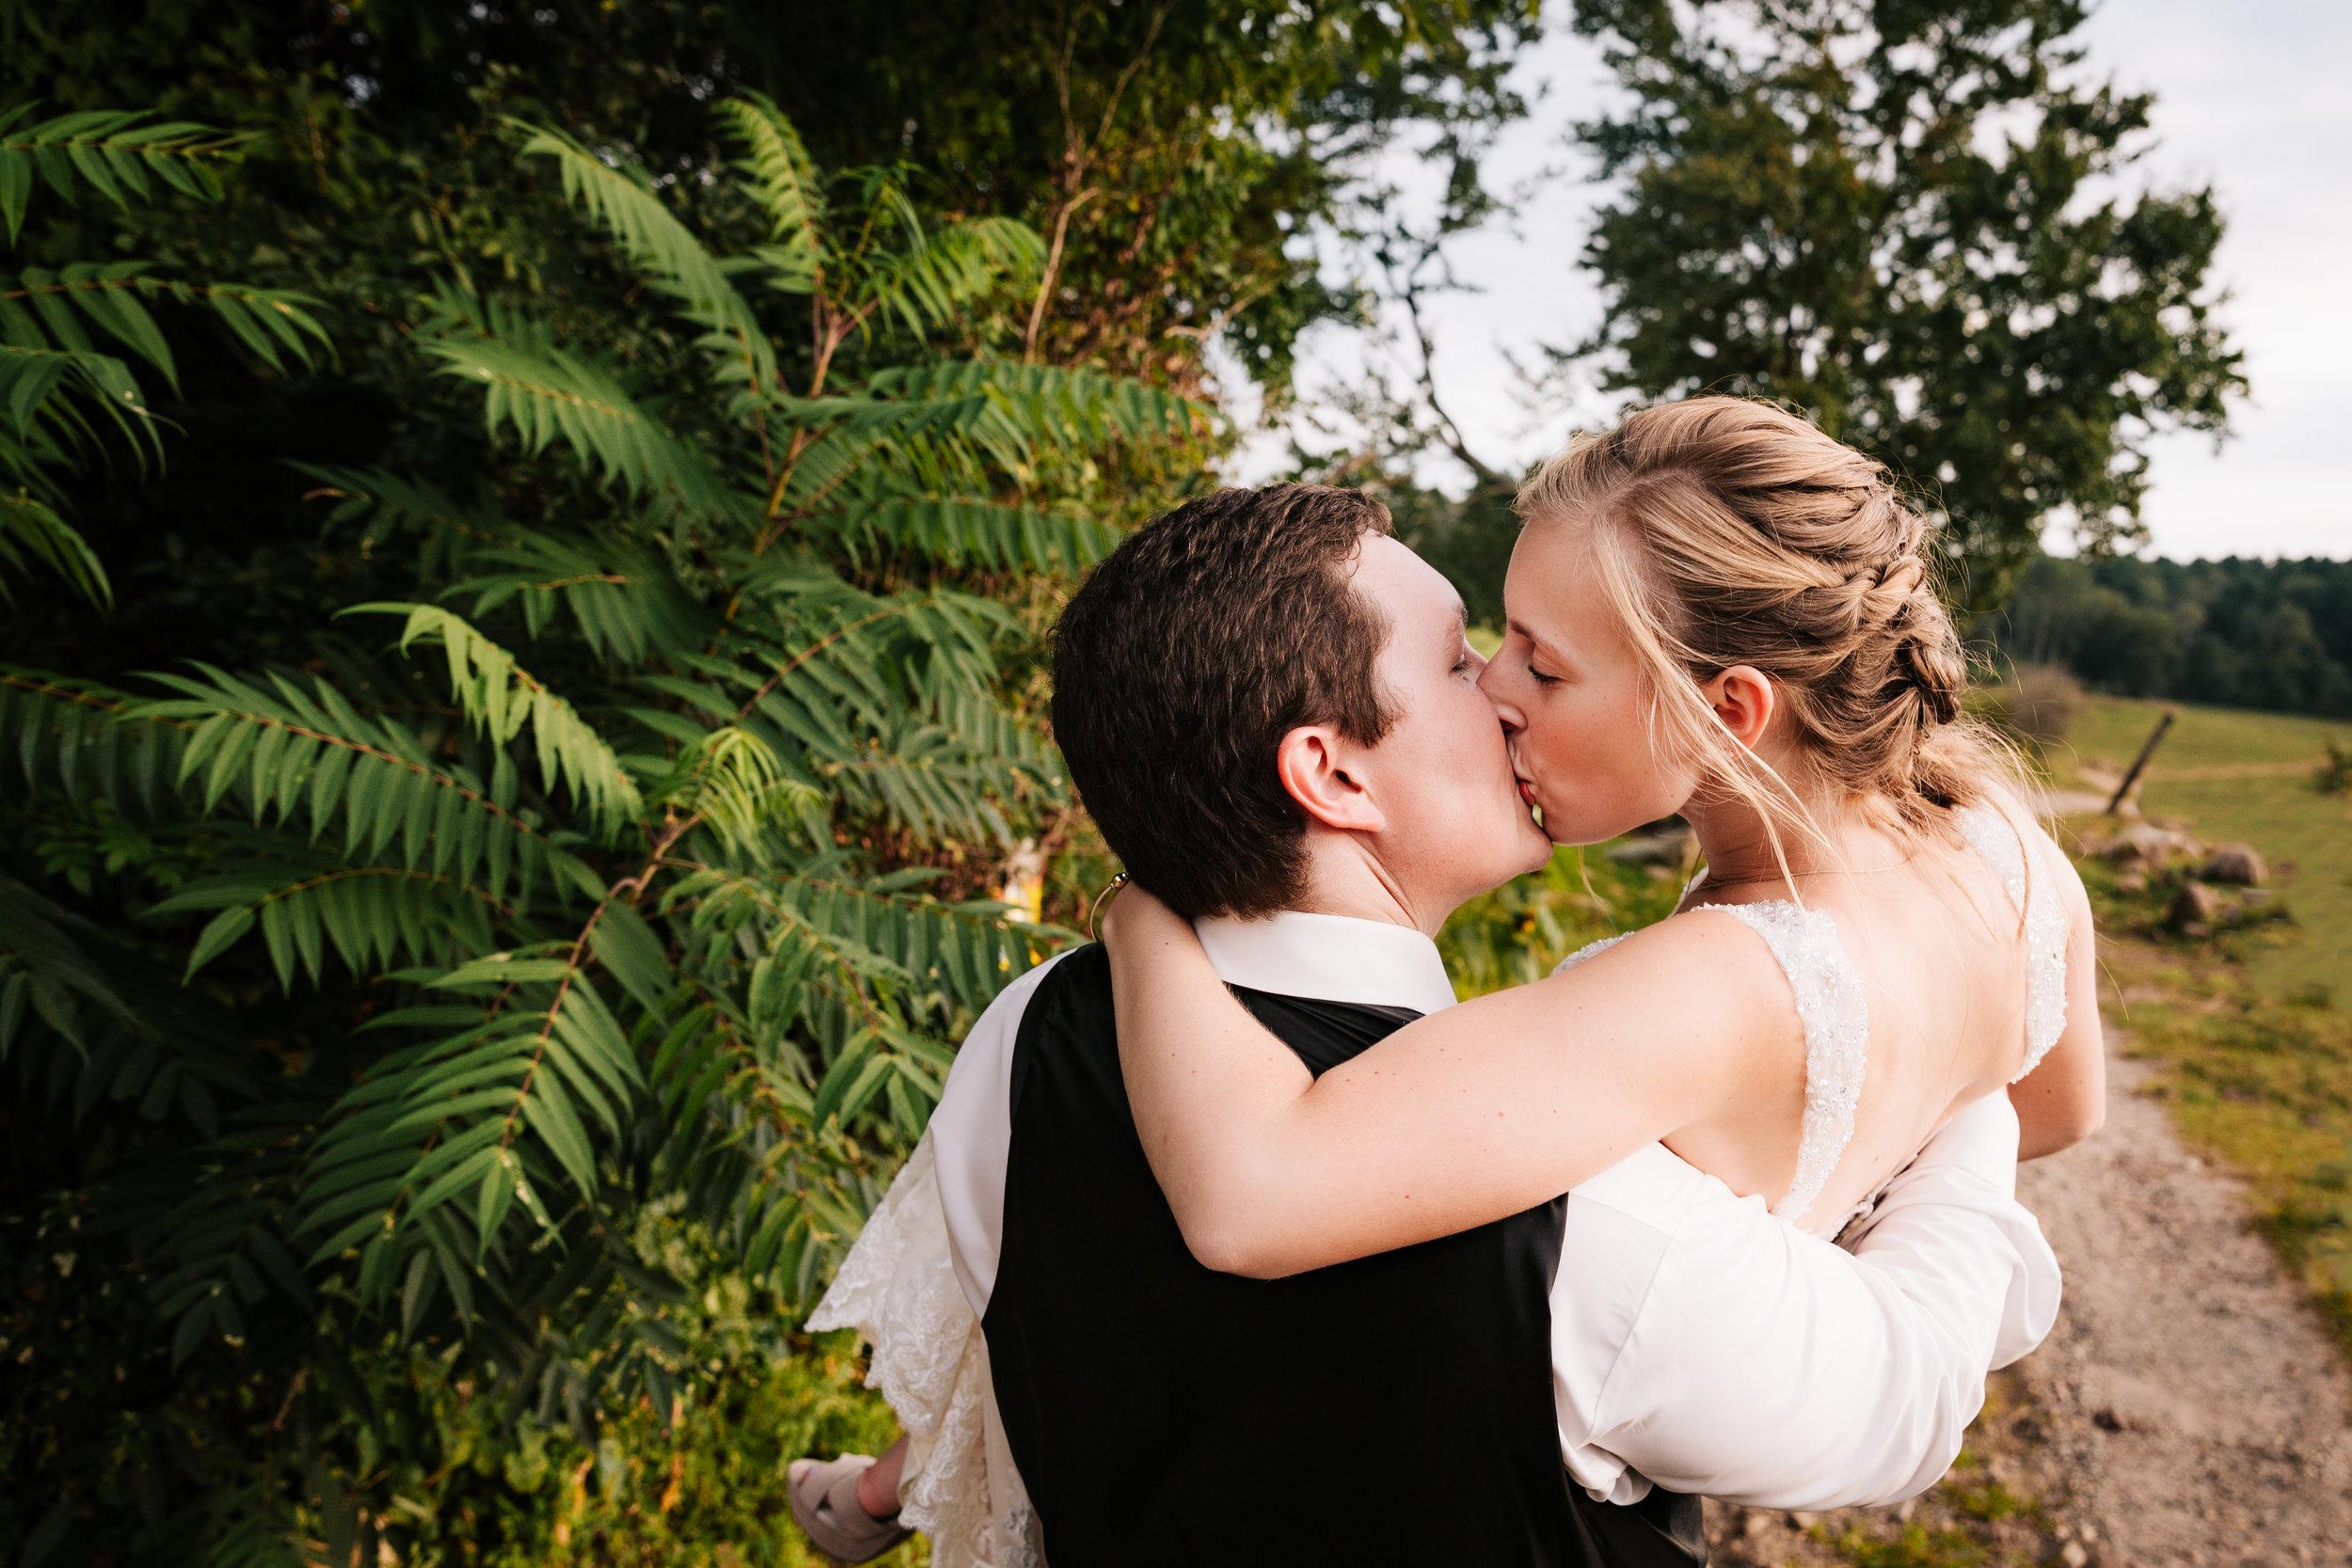 55 adventurous-fun-natural-wedding-photographer-salem-cross-inn-boston-massachusetts-andrea-van-orsouw-photography.jpg